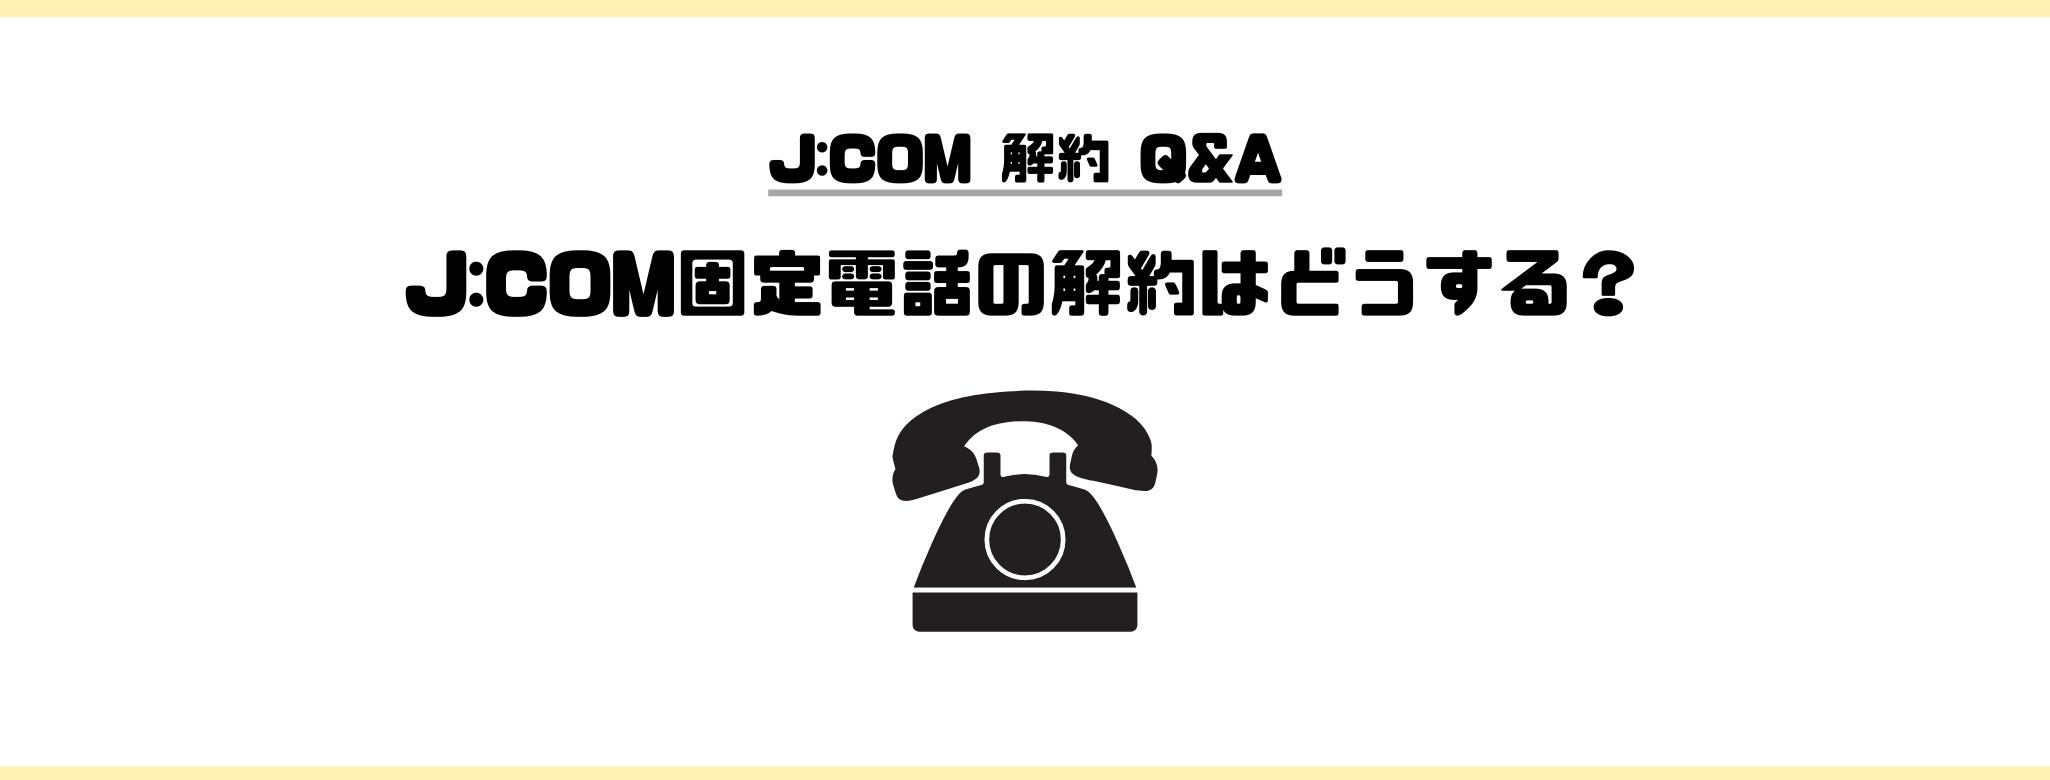 J:COM_解約_固定電話